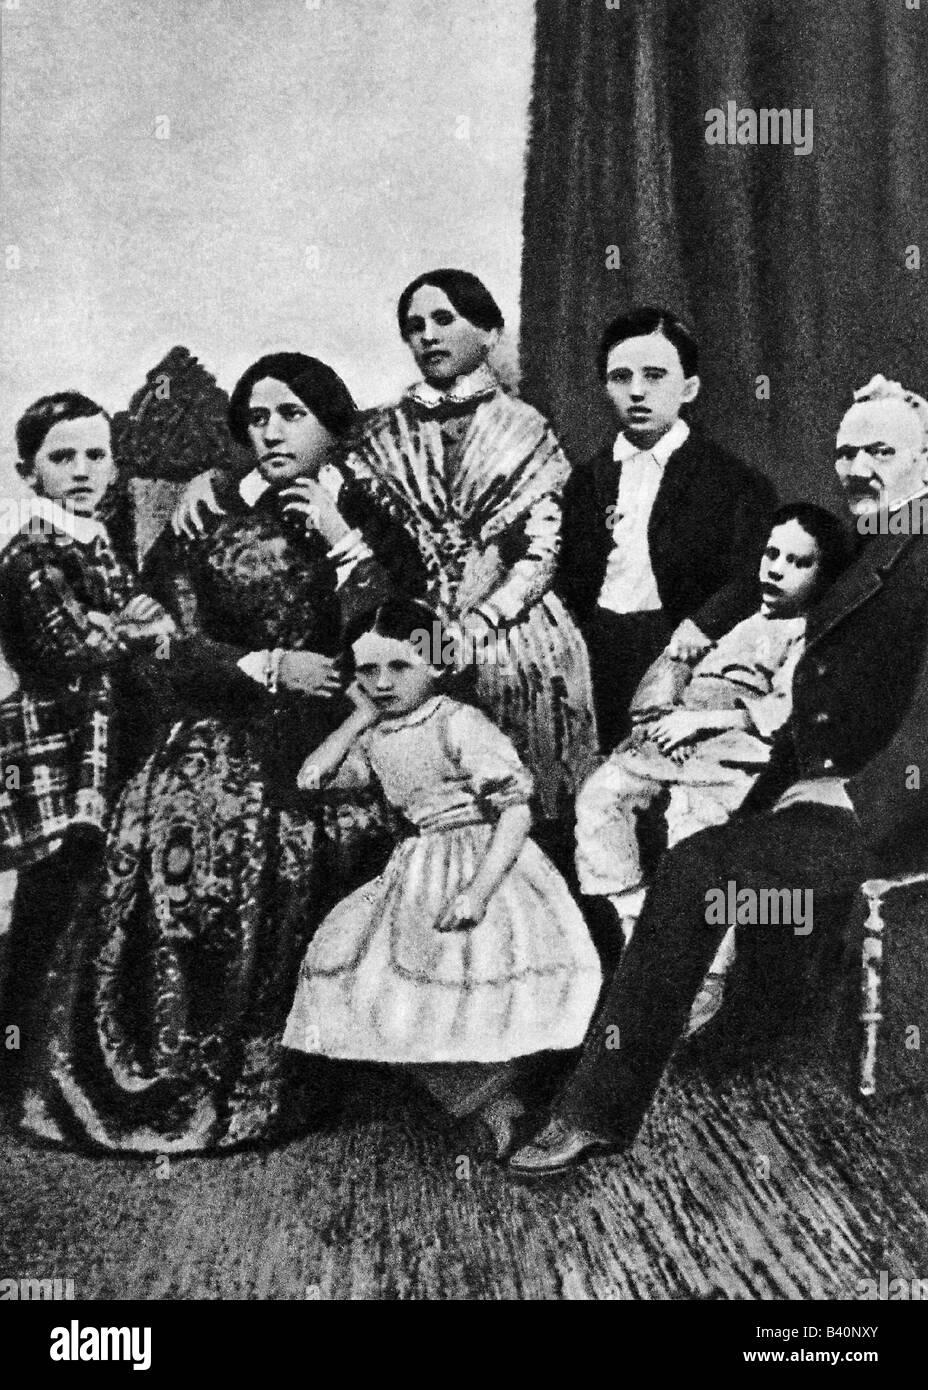 Pyotr Ilyich Tchaikovsky П. Чайковский 1812 Год - Славянский Марш - Москва